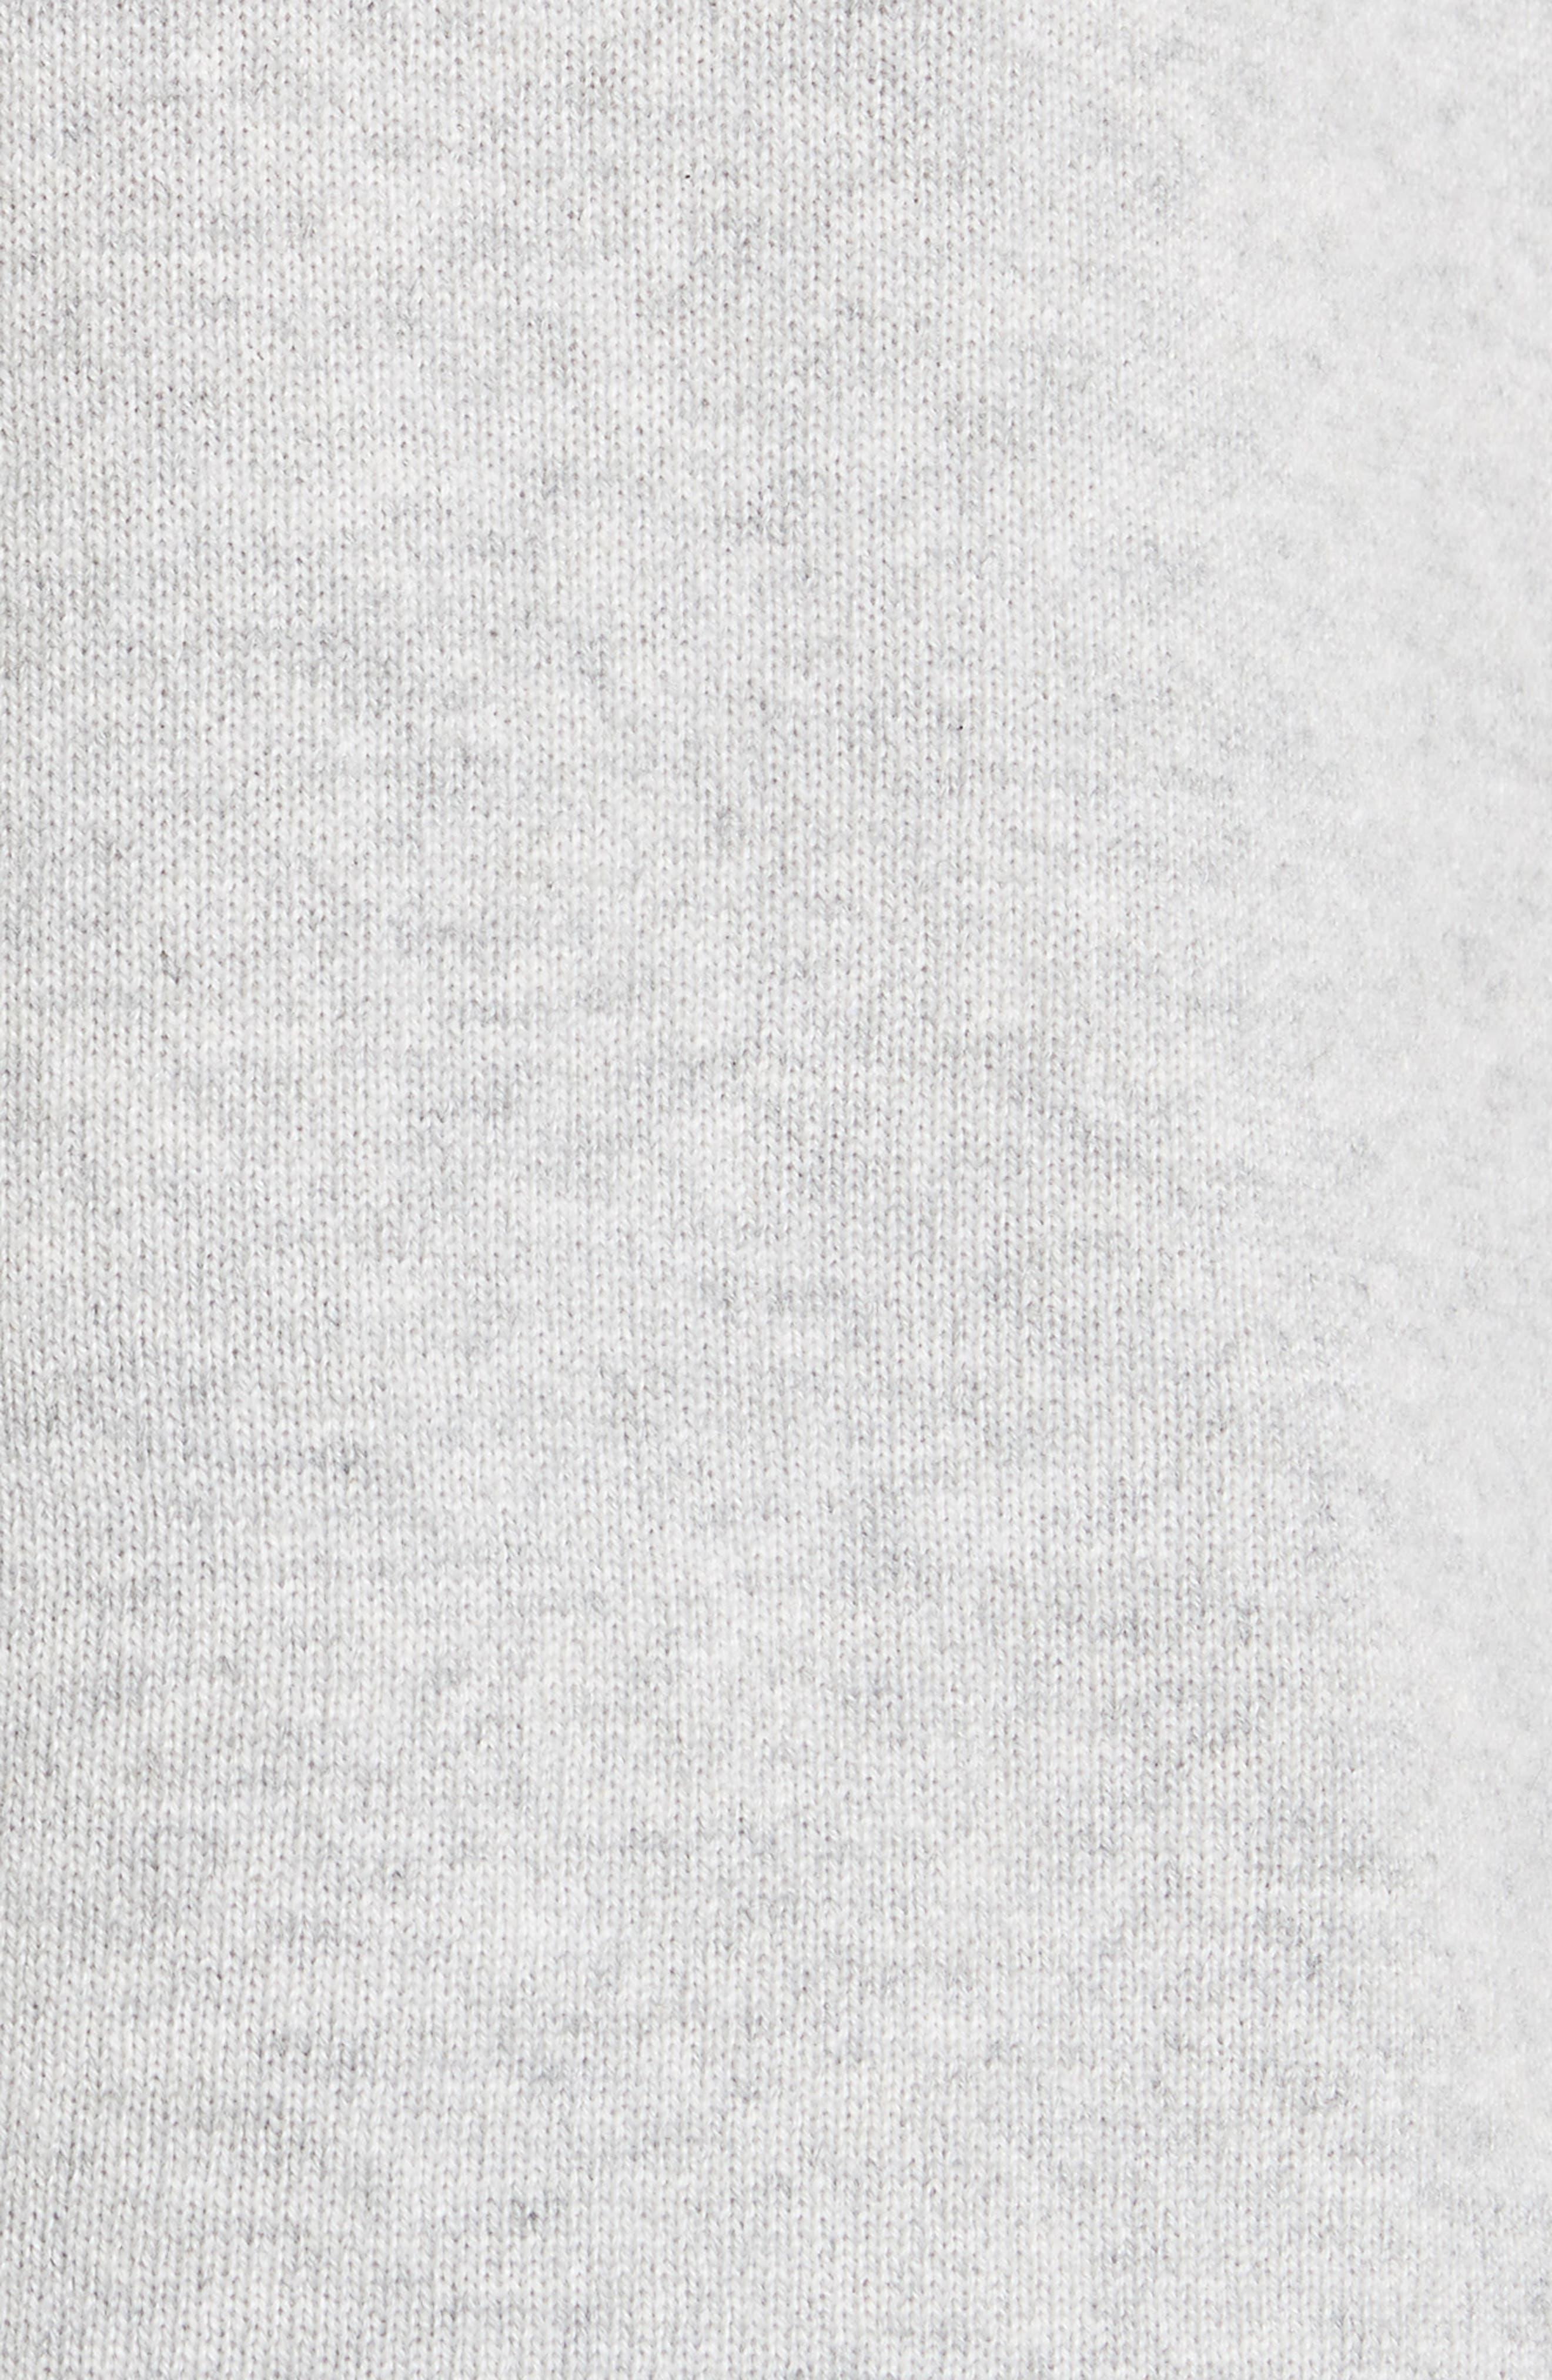 Micro Sequin Stripe Reverse Jersey Cashmere Blend Sweater,                             Alternate thumbnail 5, color,                             060